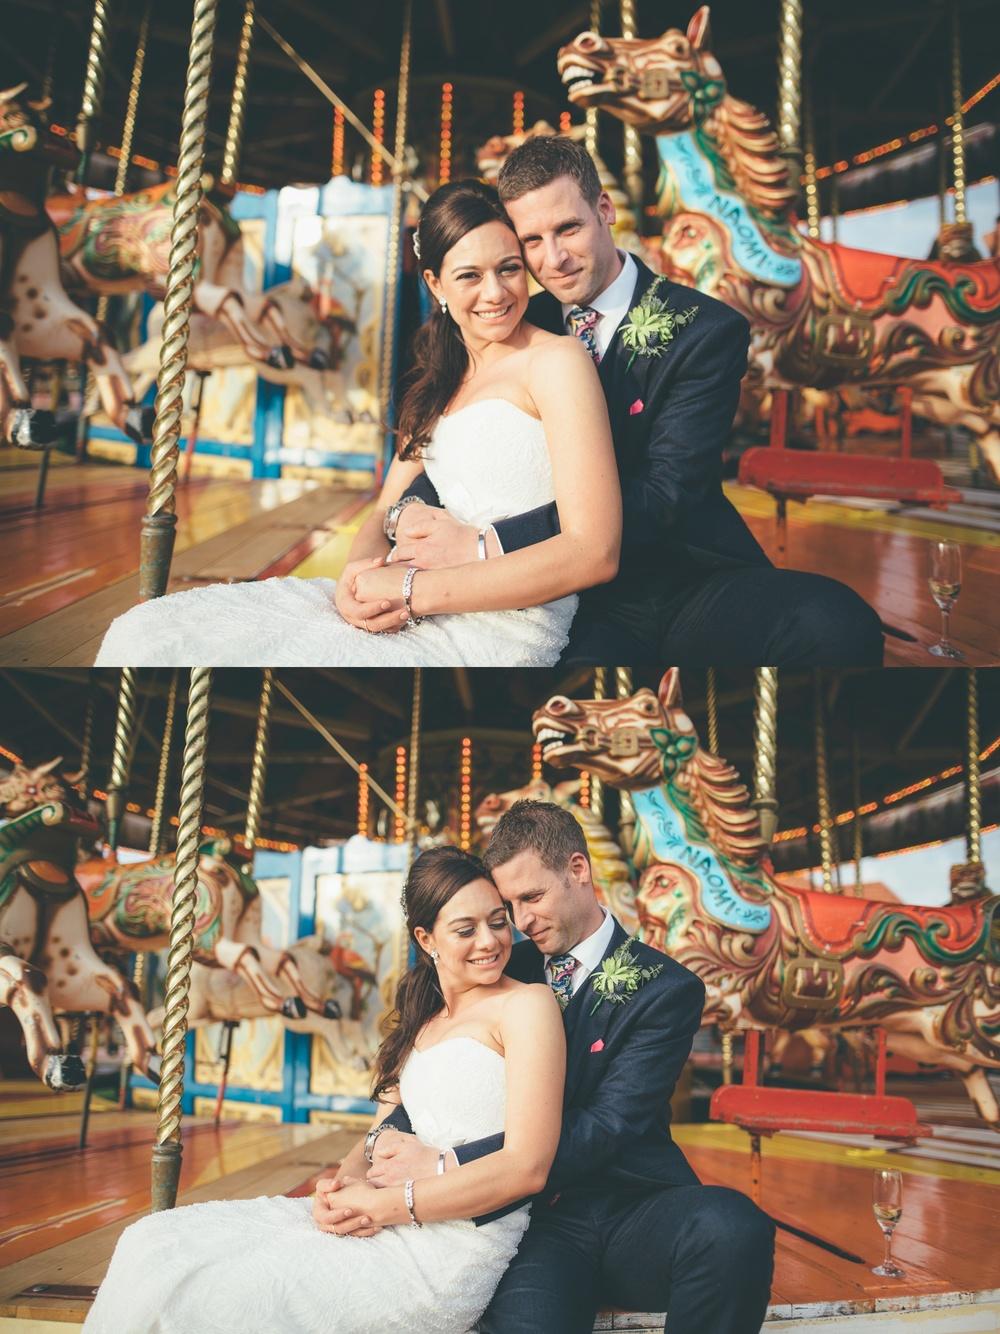 ClaireKieranwedding_PrestonCourtCanterbury_0036.jpg